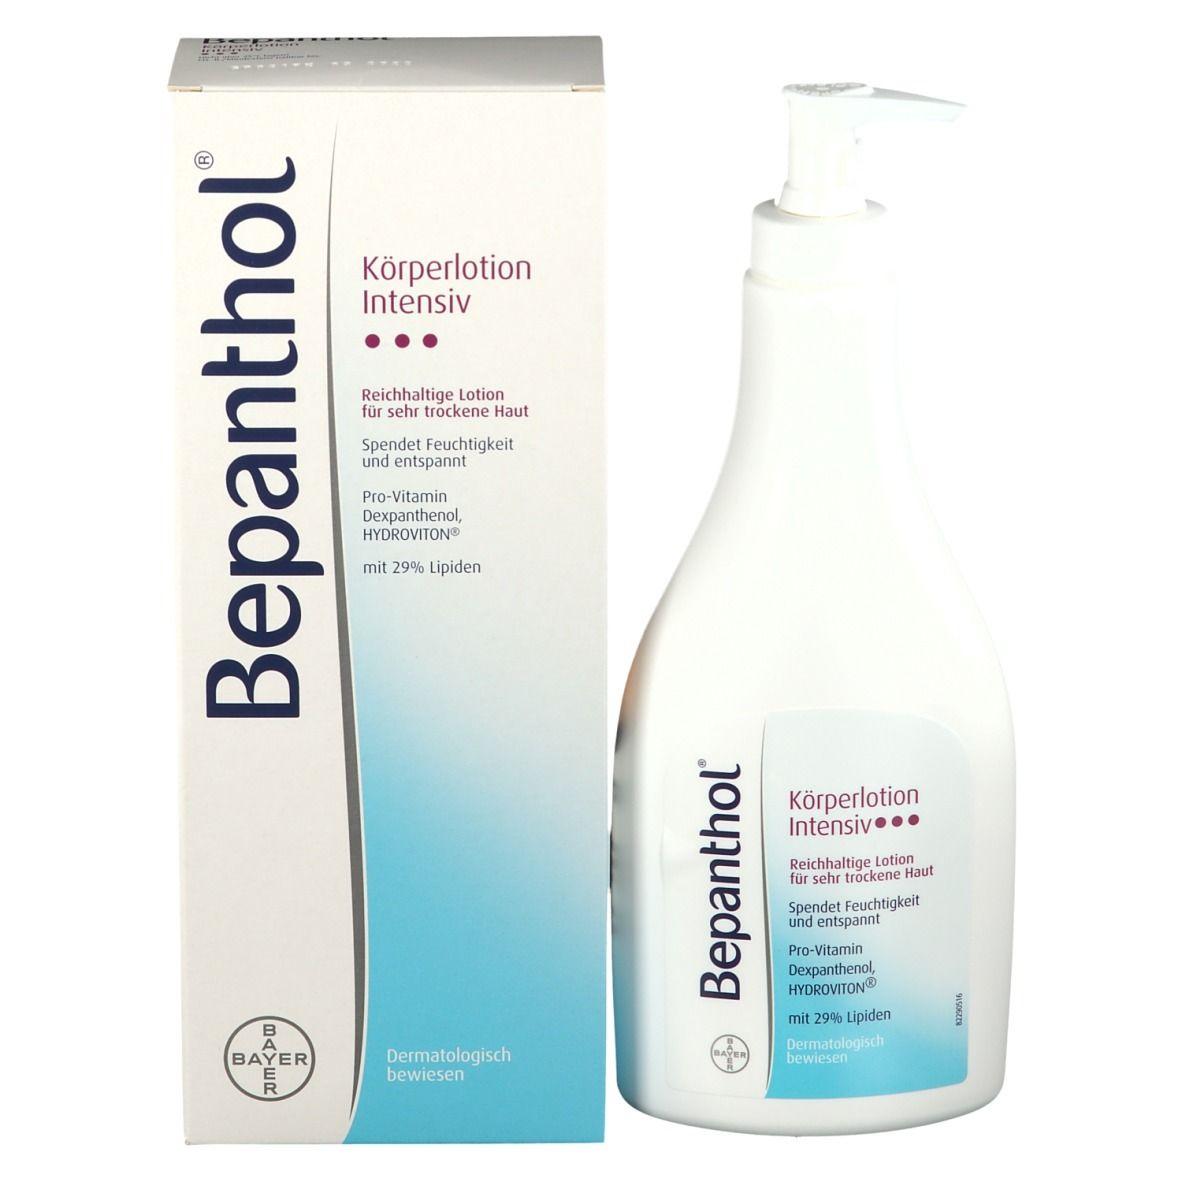 Bepanthol® Intensiv Körperlotion für sehr trockene Haut Pumpspender